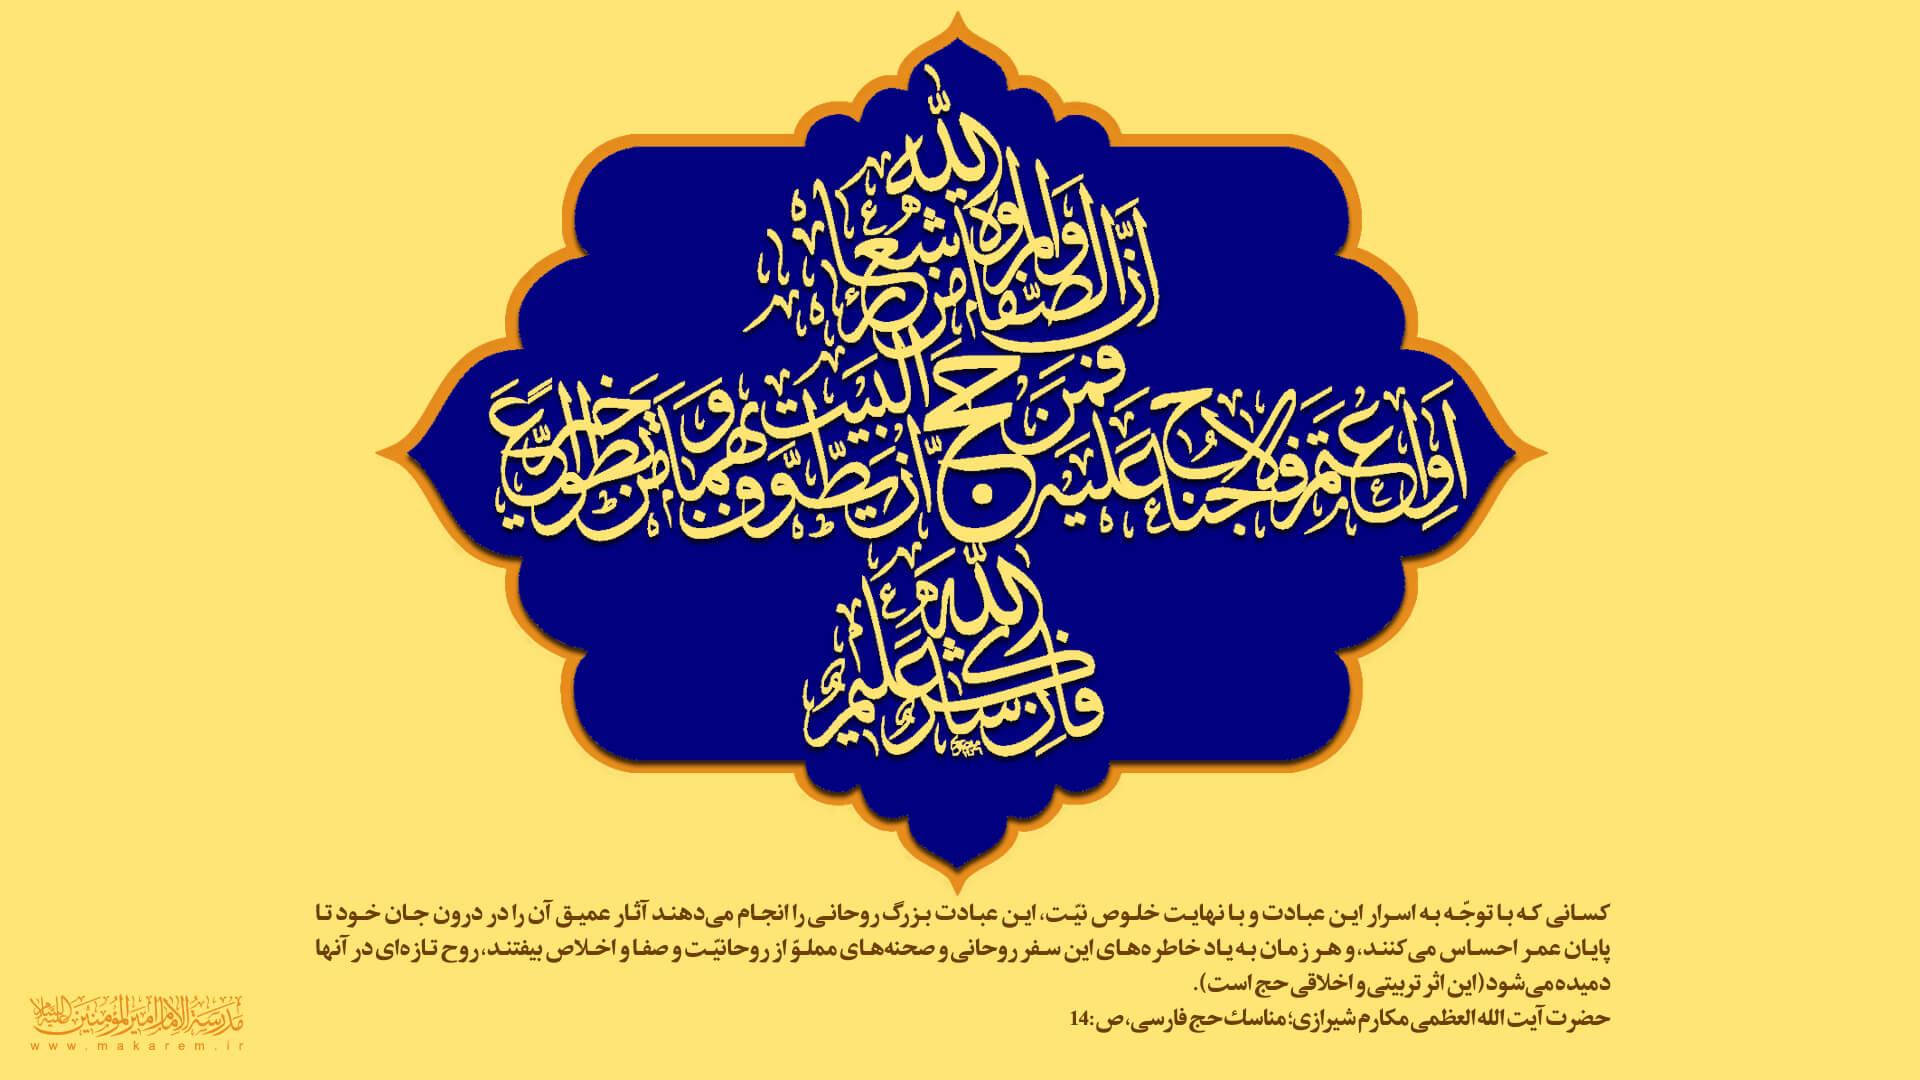 حج-مدرسه الامام امیر المومنین (ع)